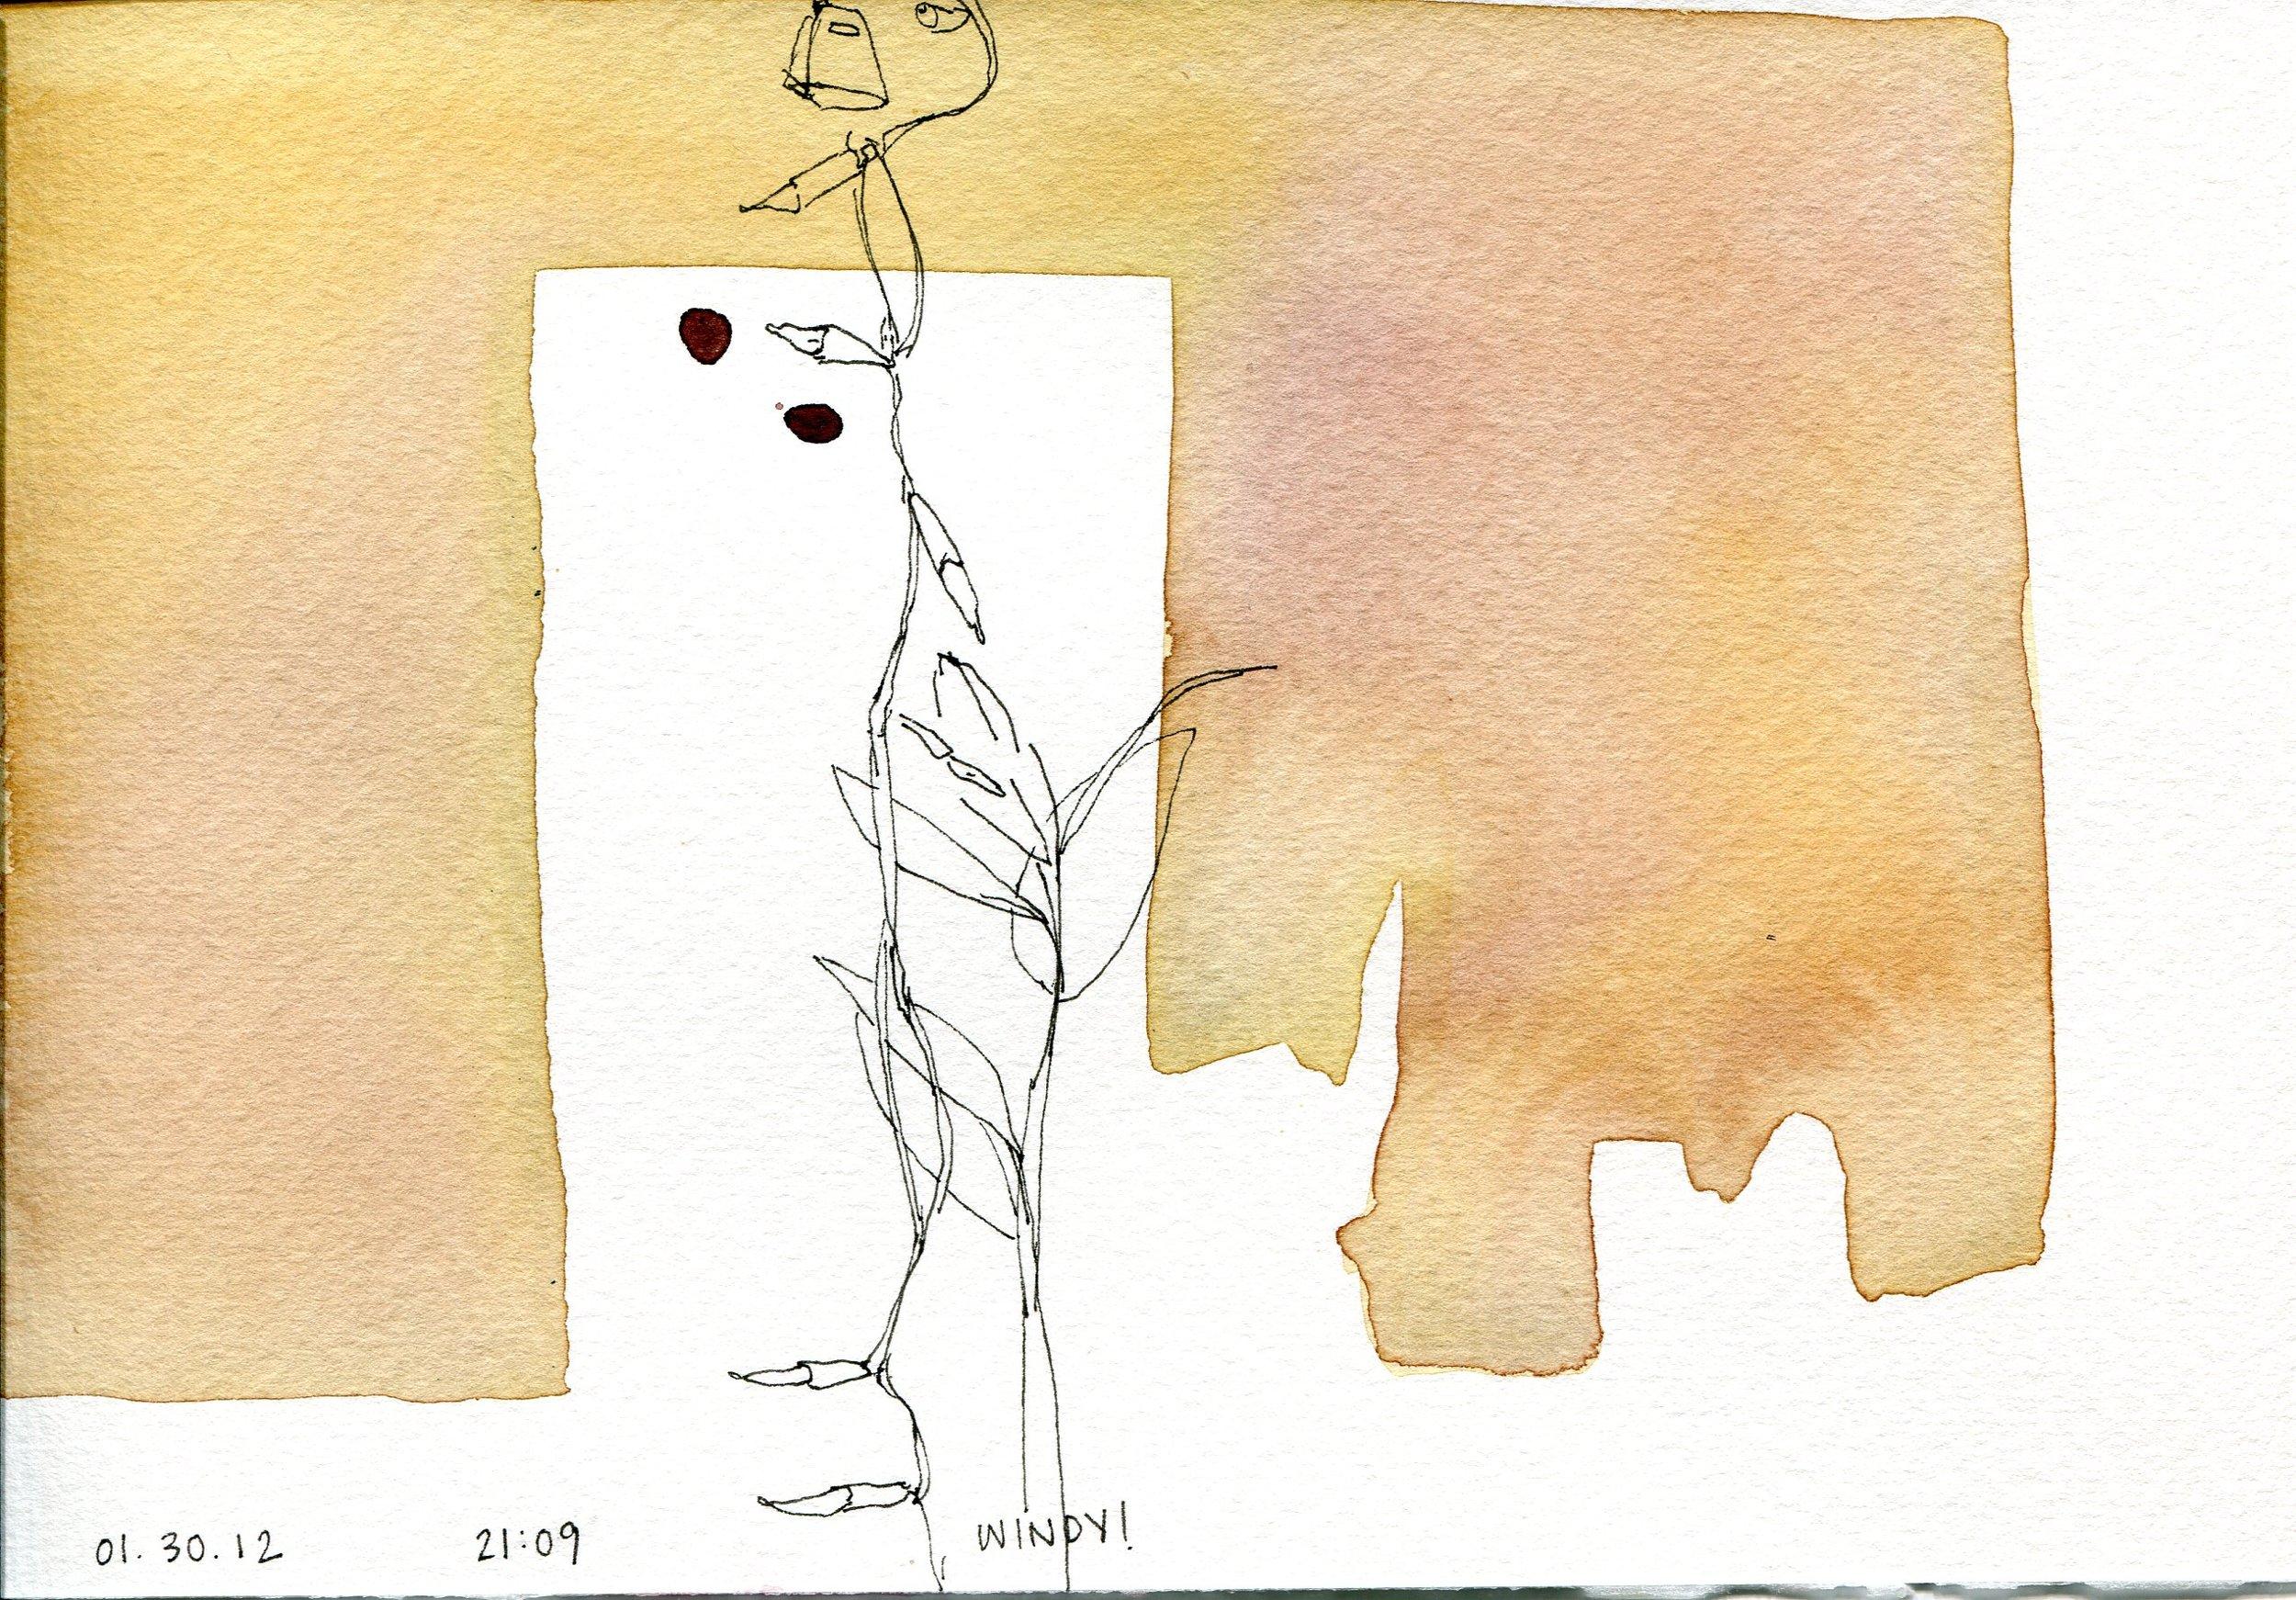 2012-02-04 drawing002.jpg